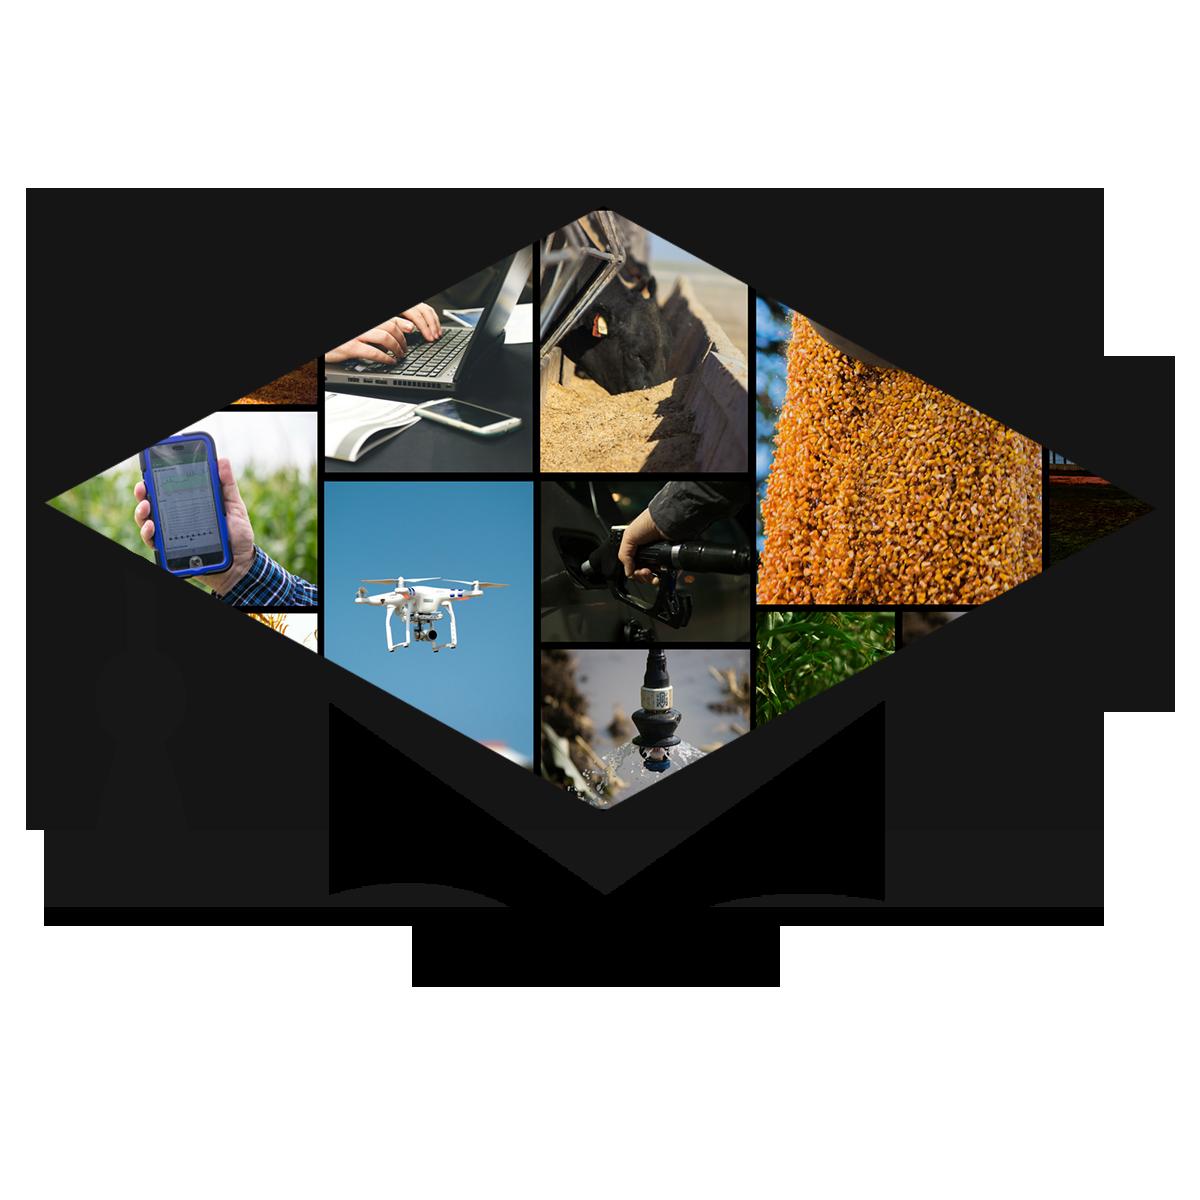 https://kscorn.com/wp-content/uploads/2018/04/Careers-in-Corn-Graduation-Cap.png